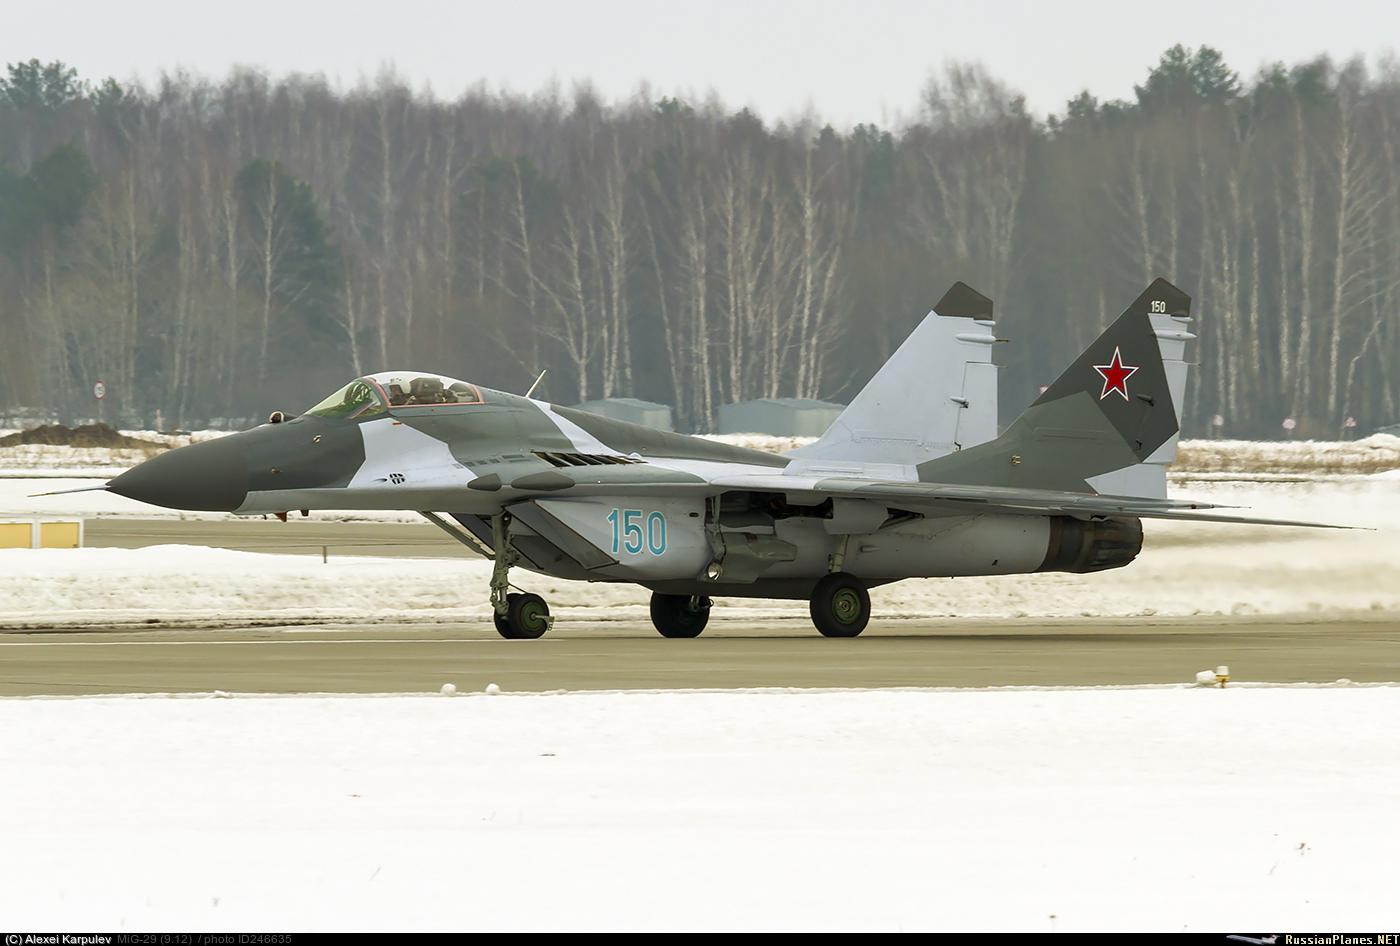 https://russianplanes.net/images/to247000/246635.jpg